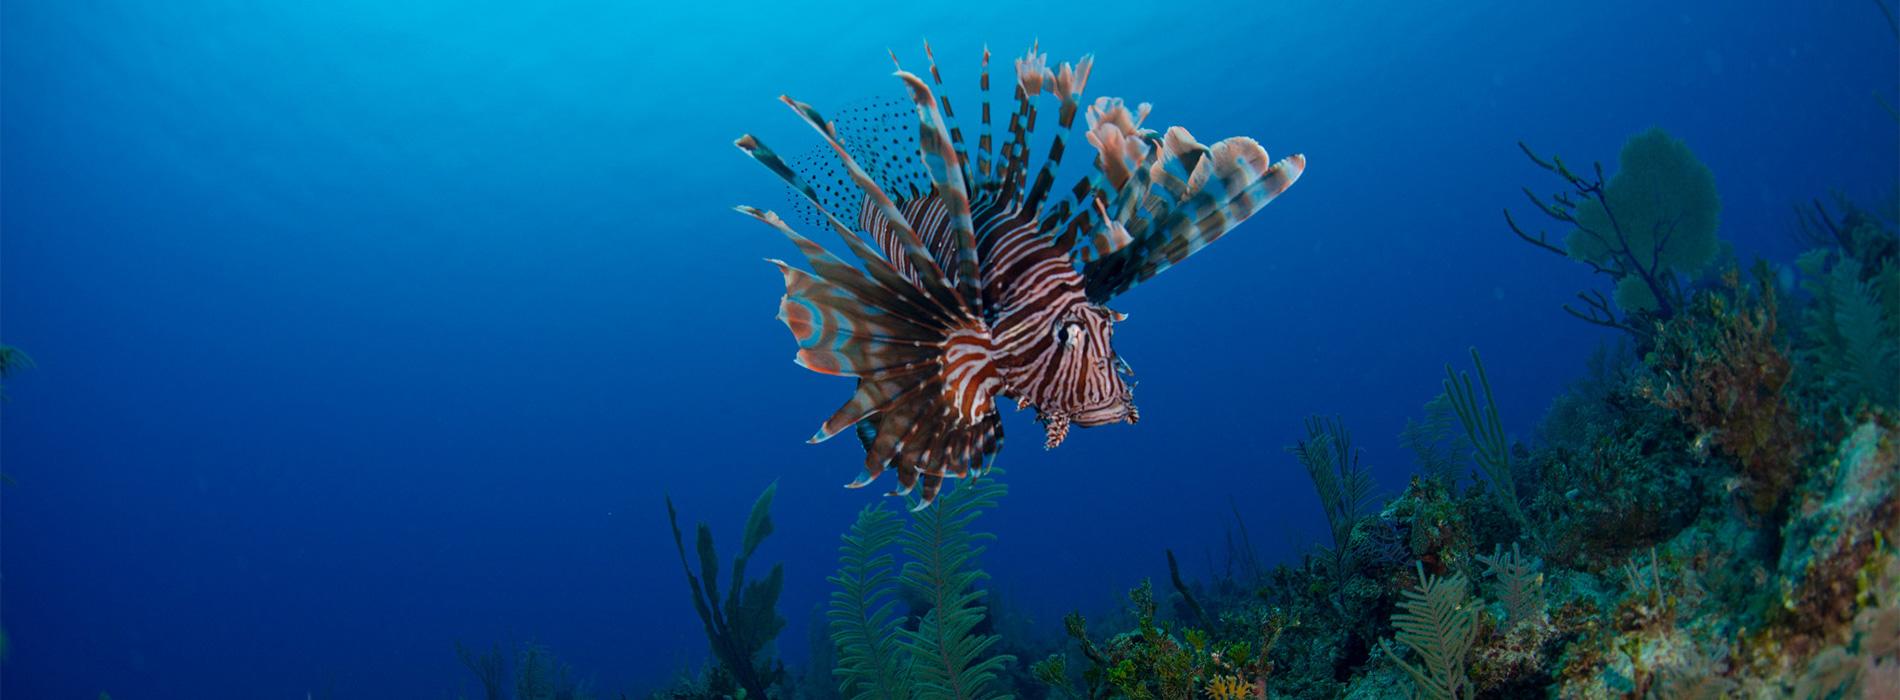 Caribbean Lionfish